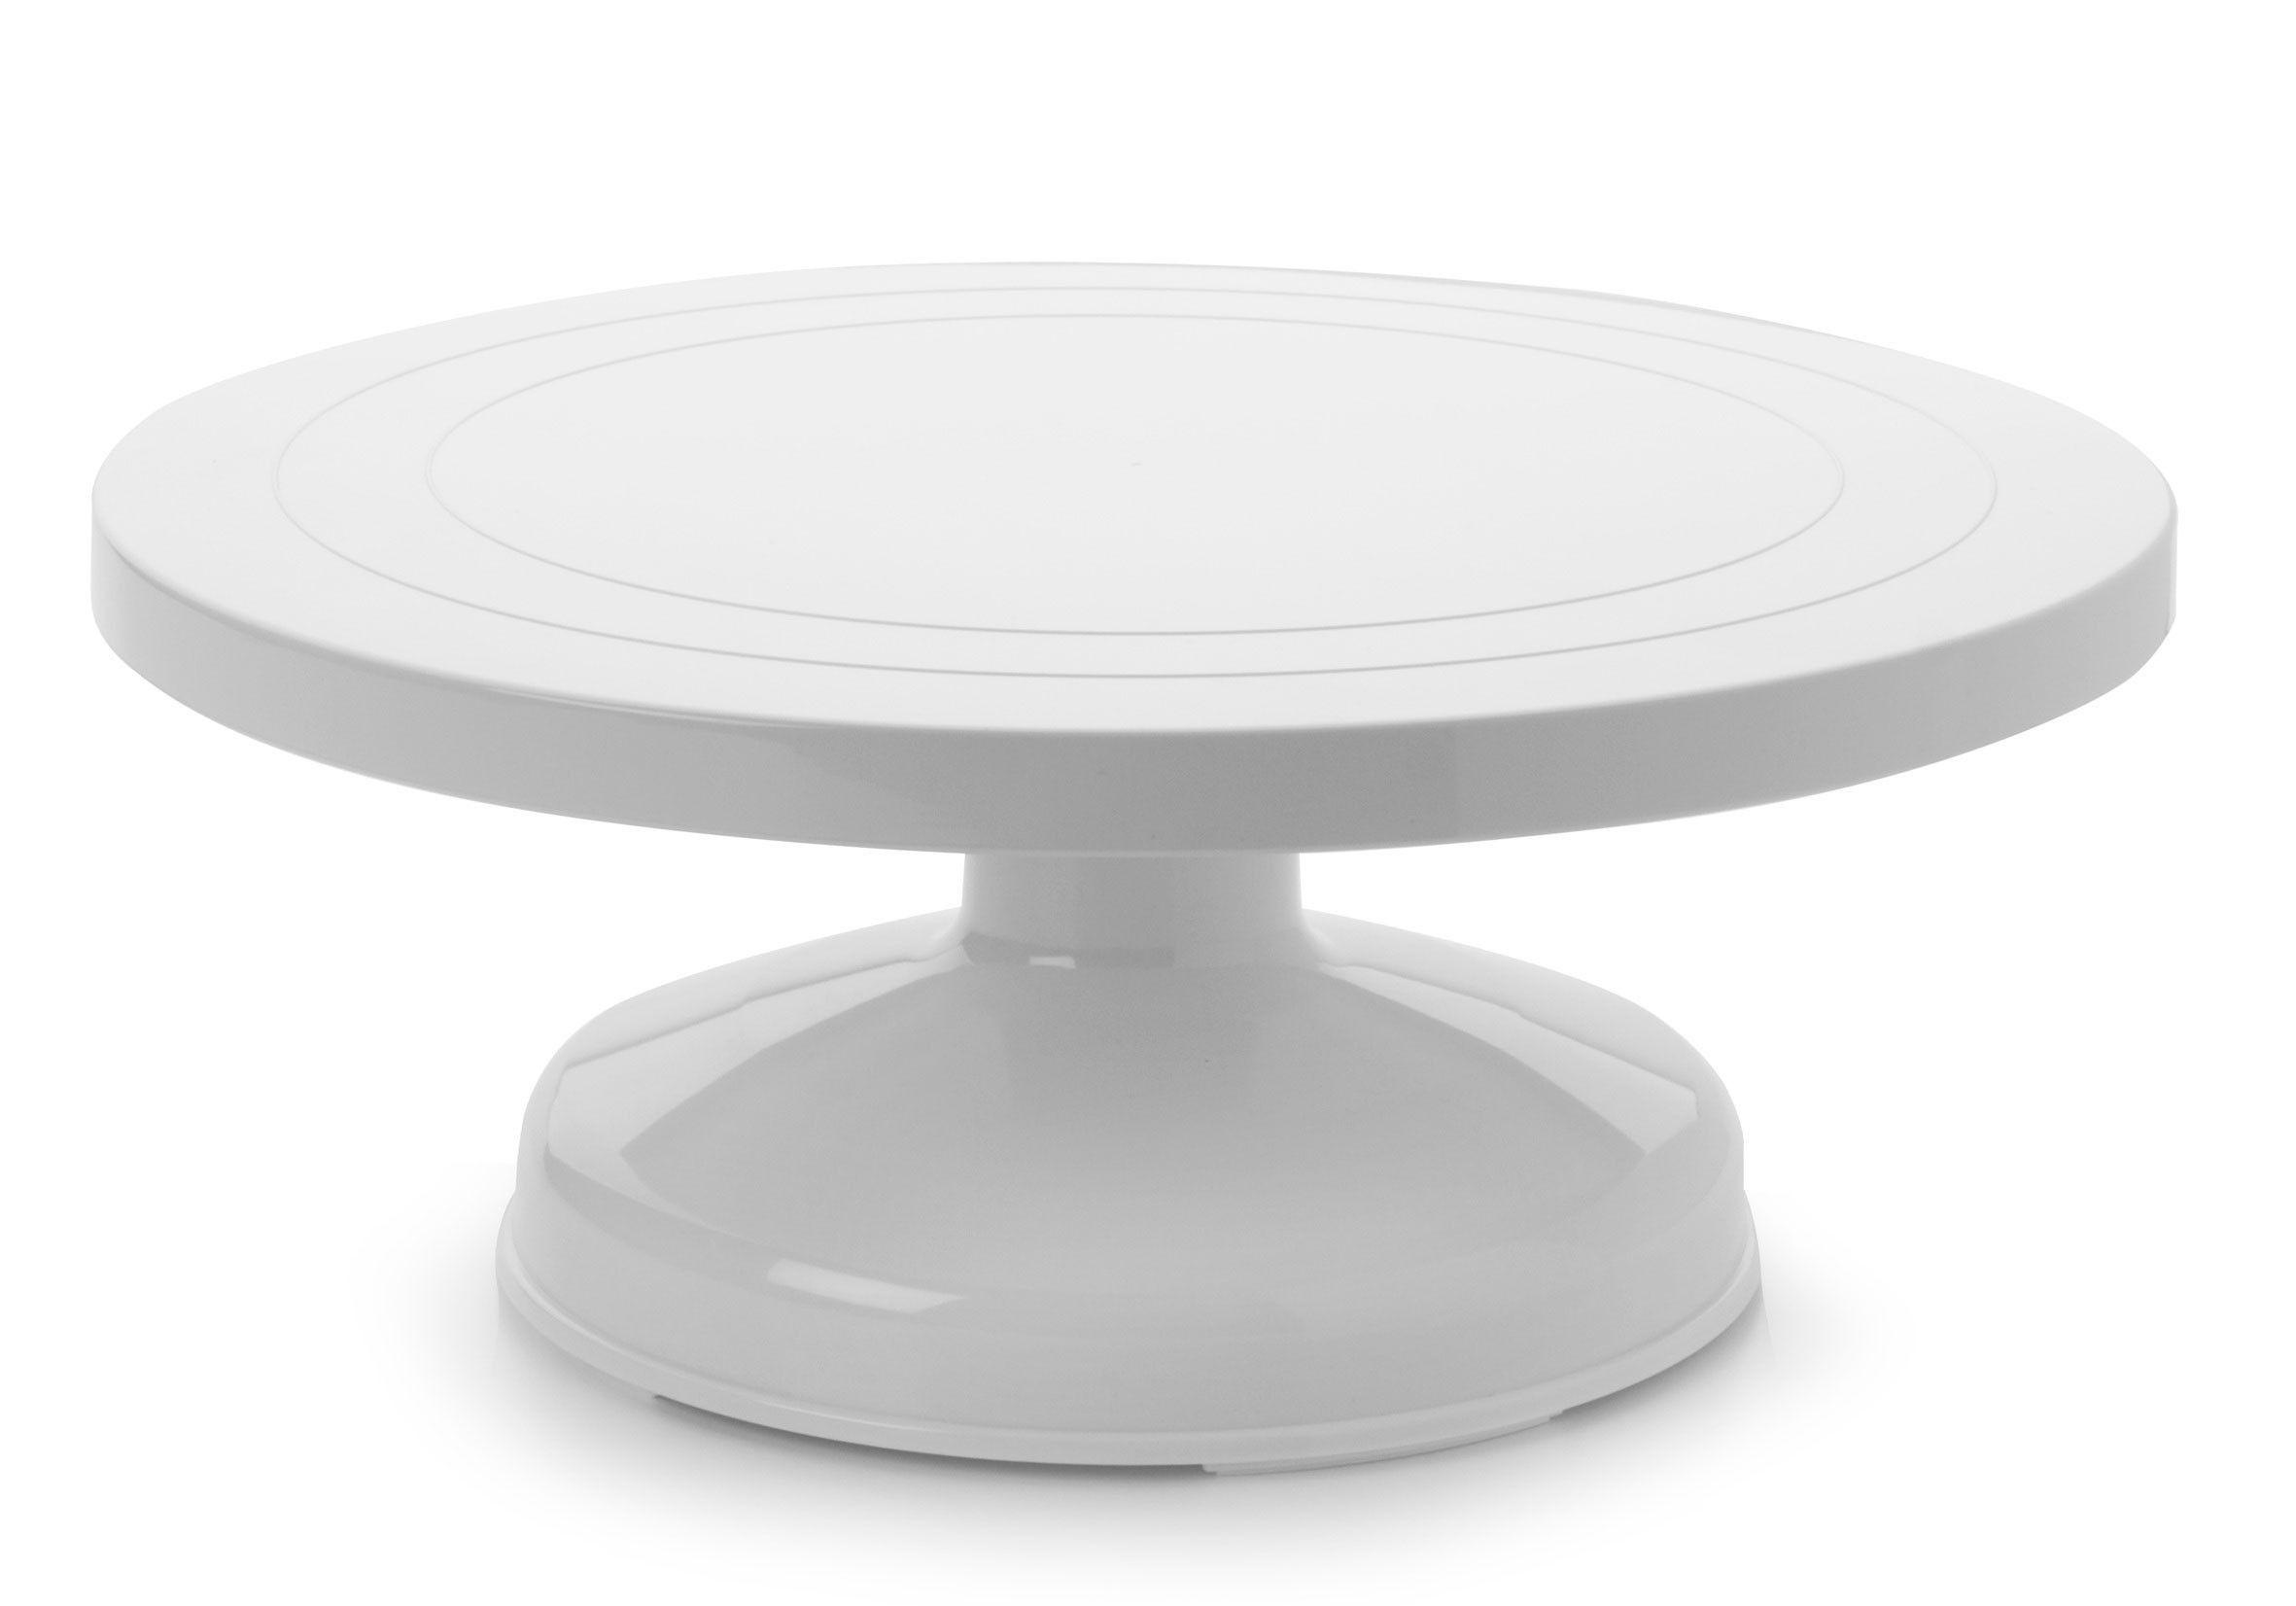 Circular de madera giratoria Para servir pizza de 70 cm. Tabla giratoria Lazy Susan redonda